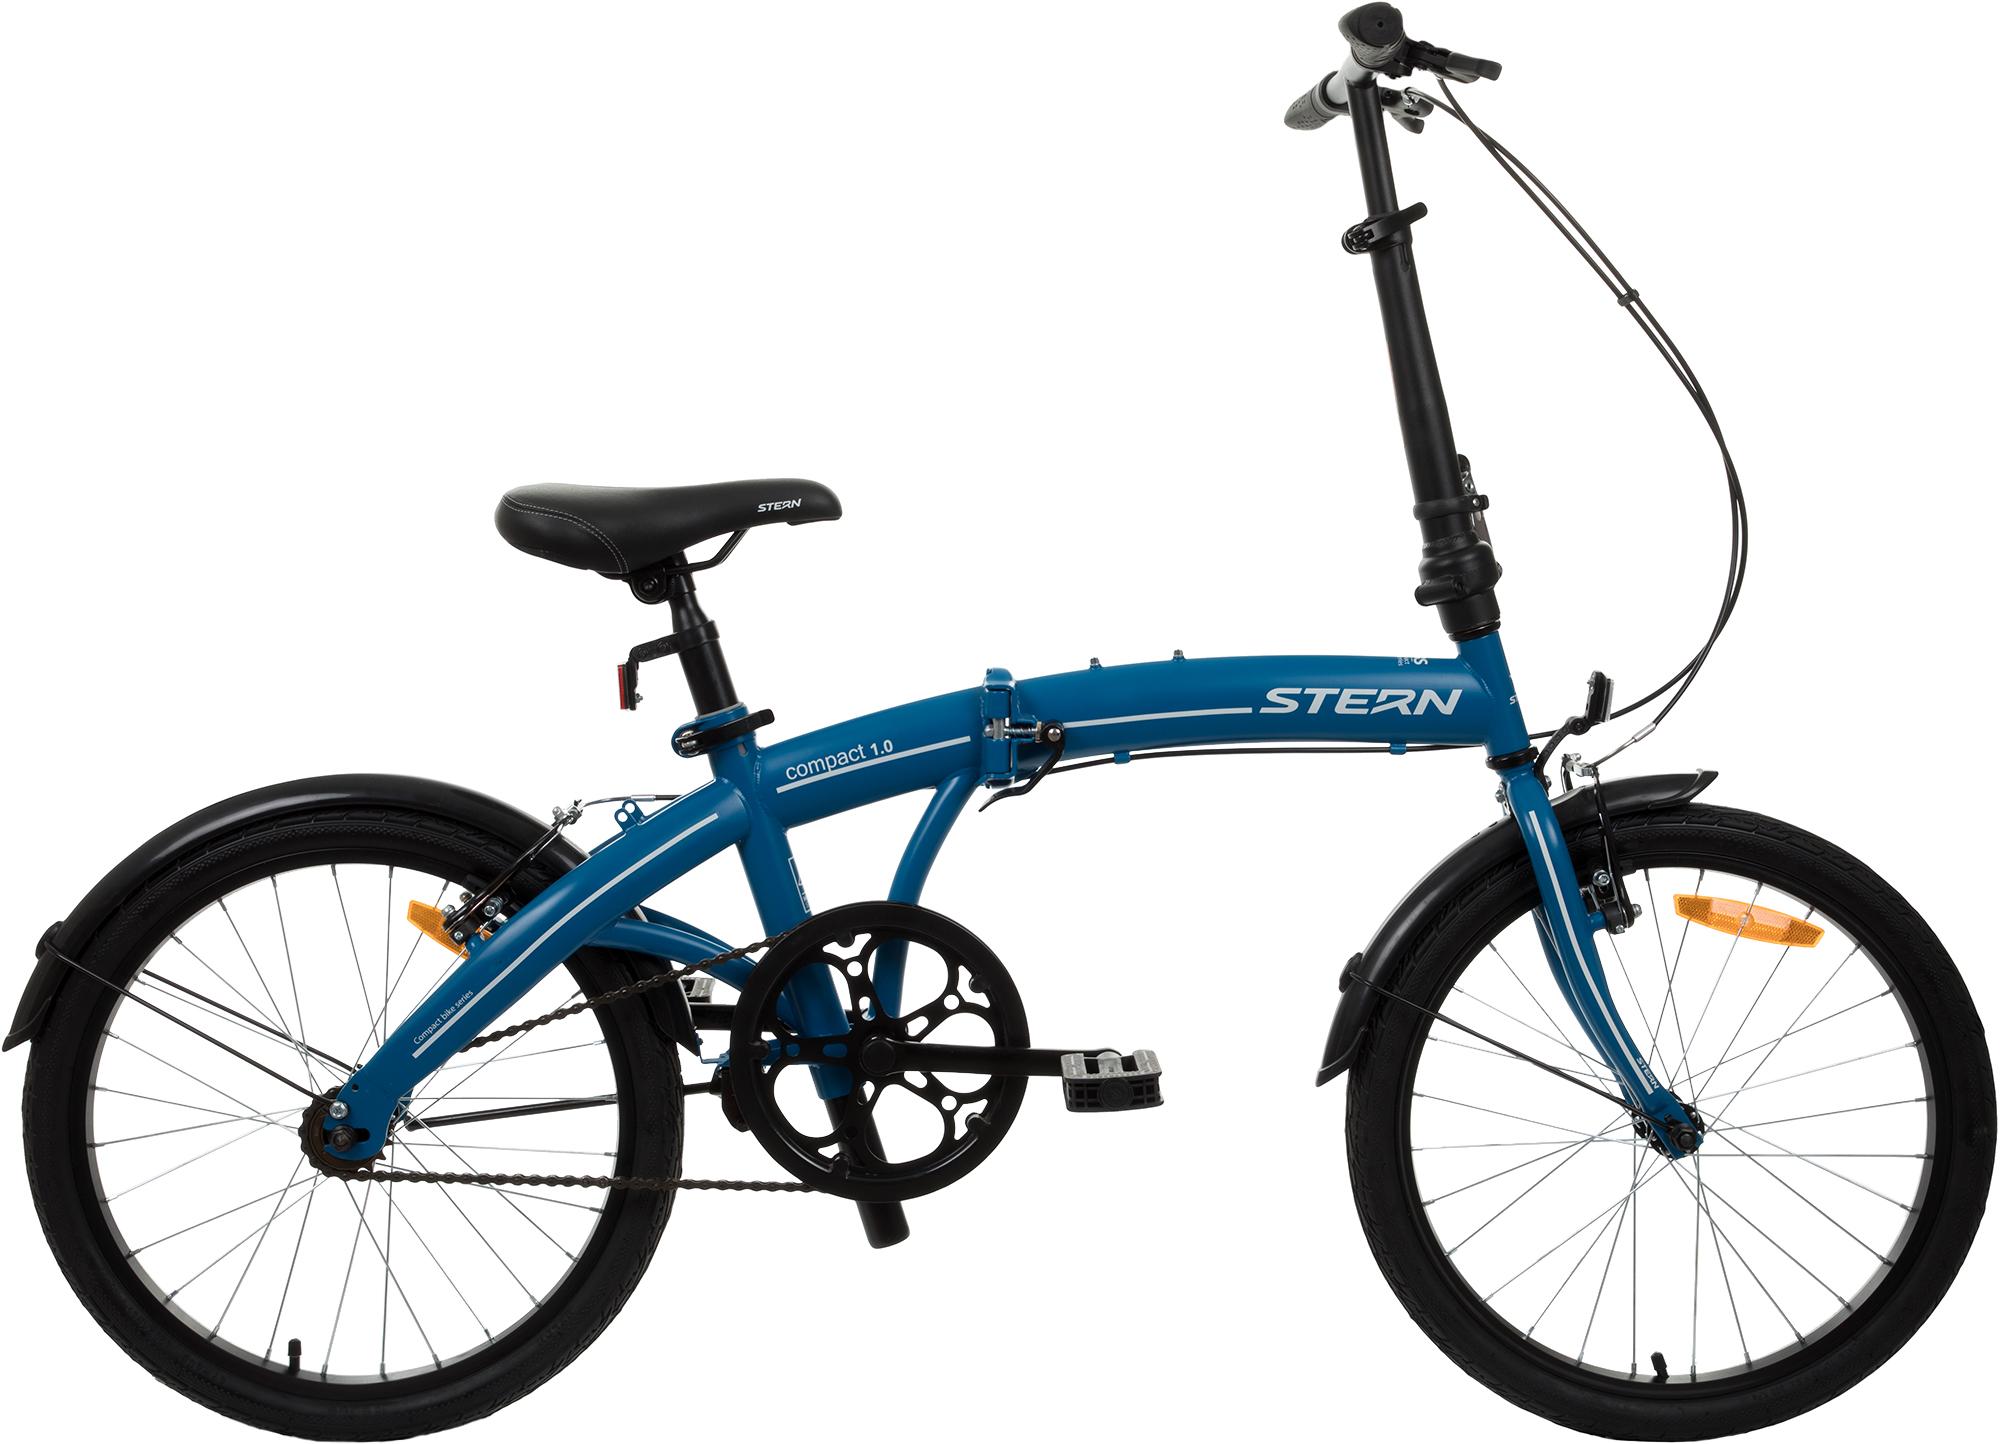 Stern Велосипед складной Stern Compact 1.0 20 цена